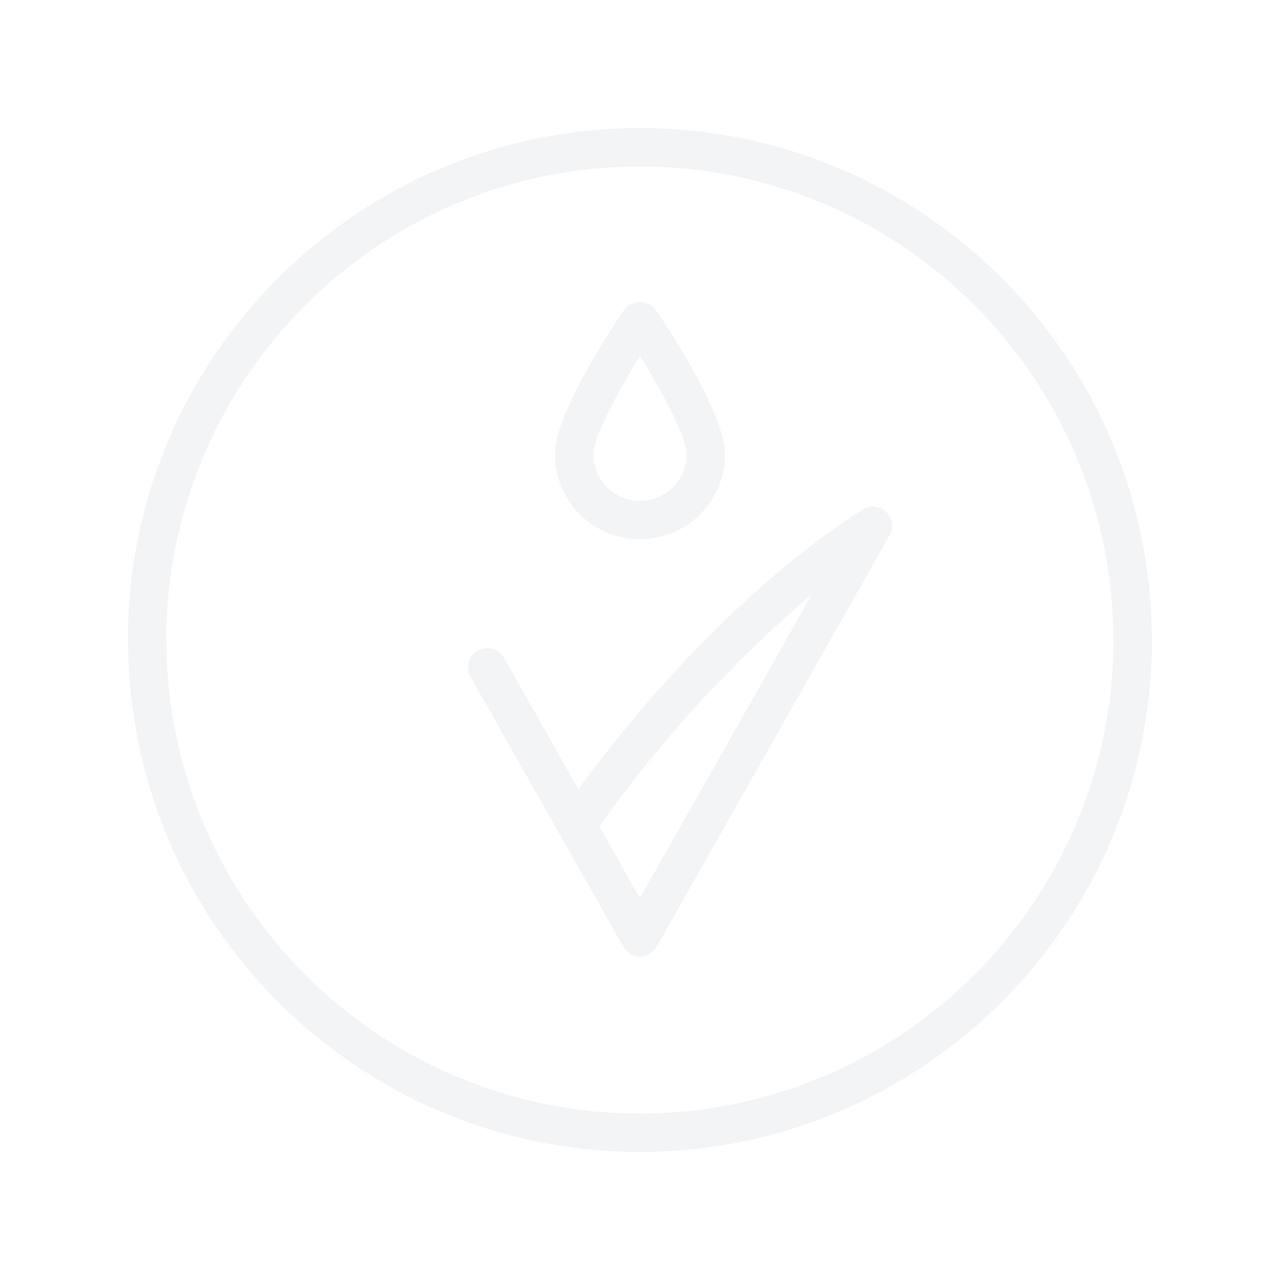 MAYBELLINE Dream Matte Blush 6g